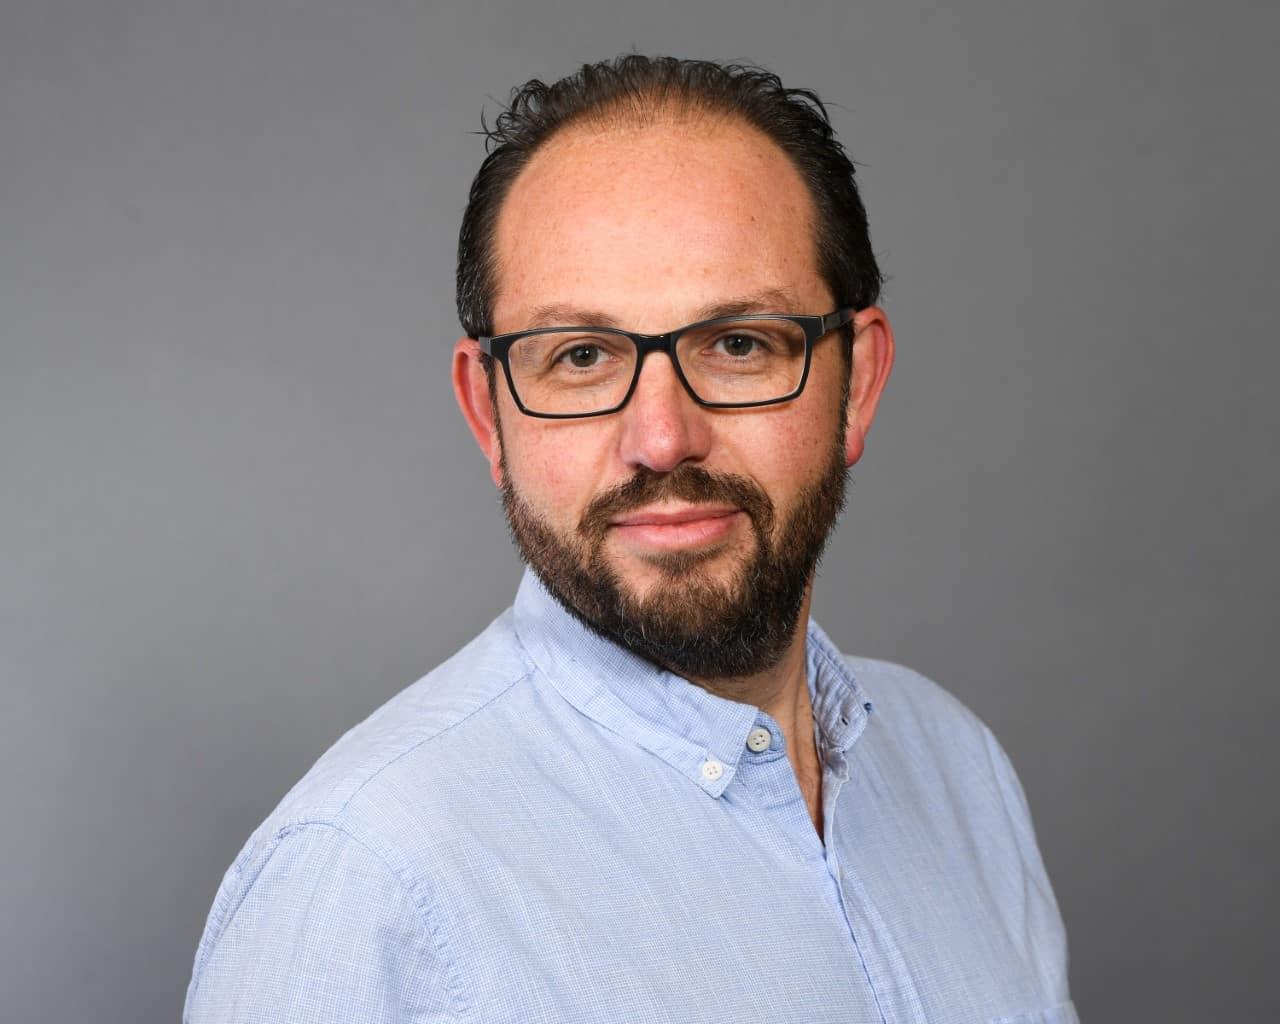 Romain Pia